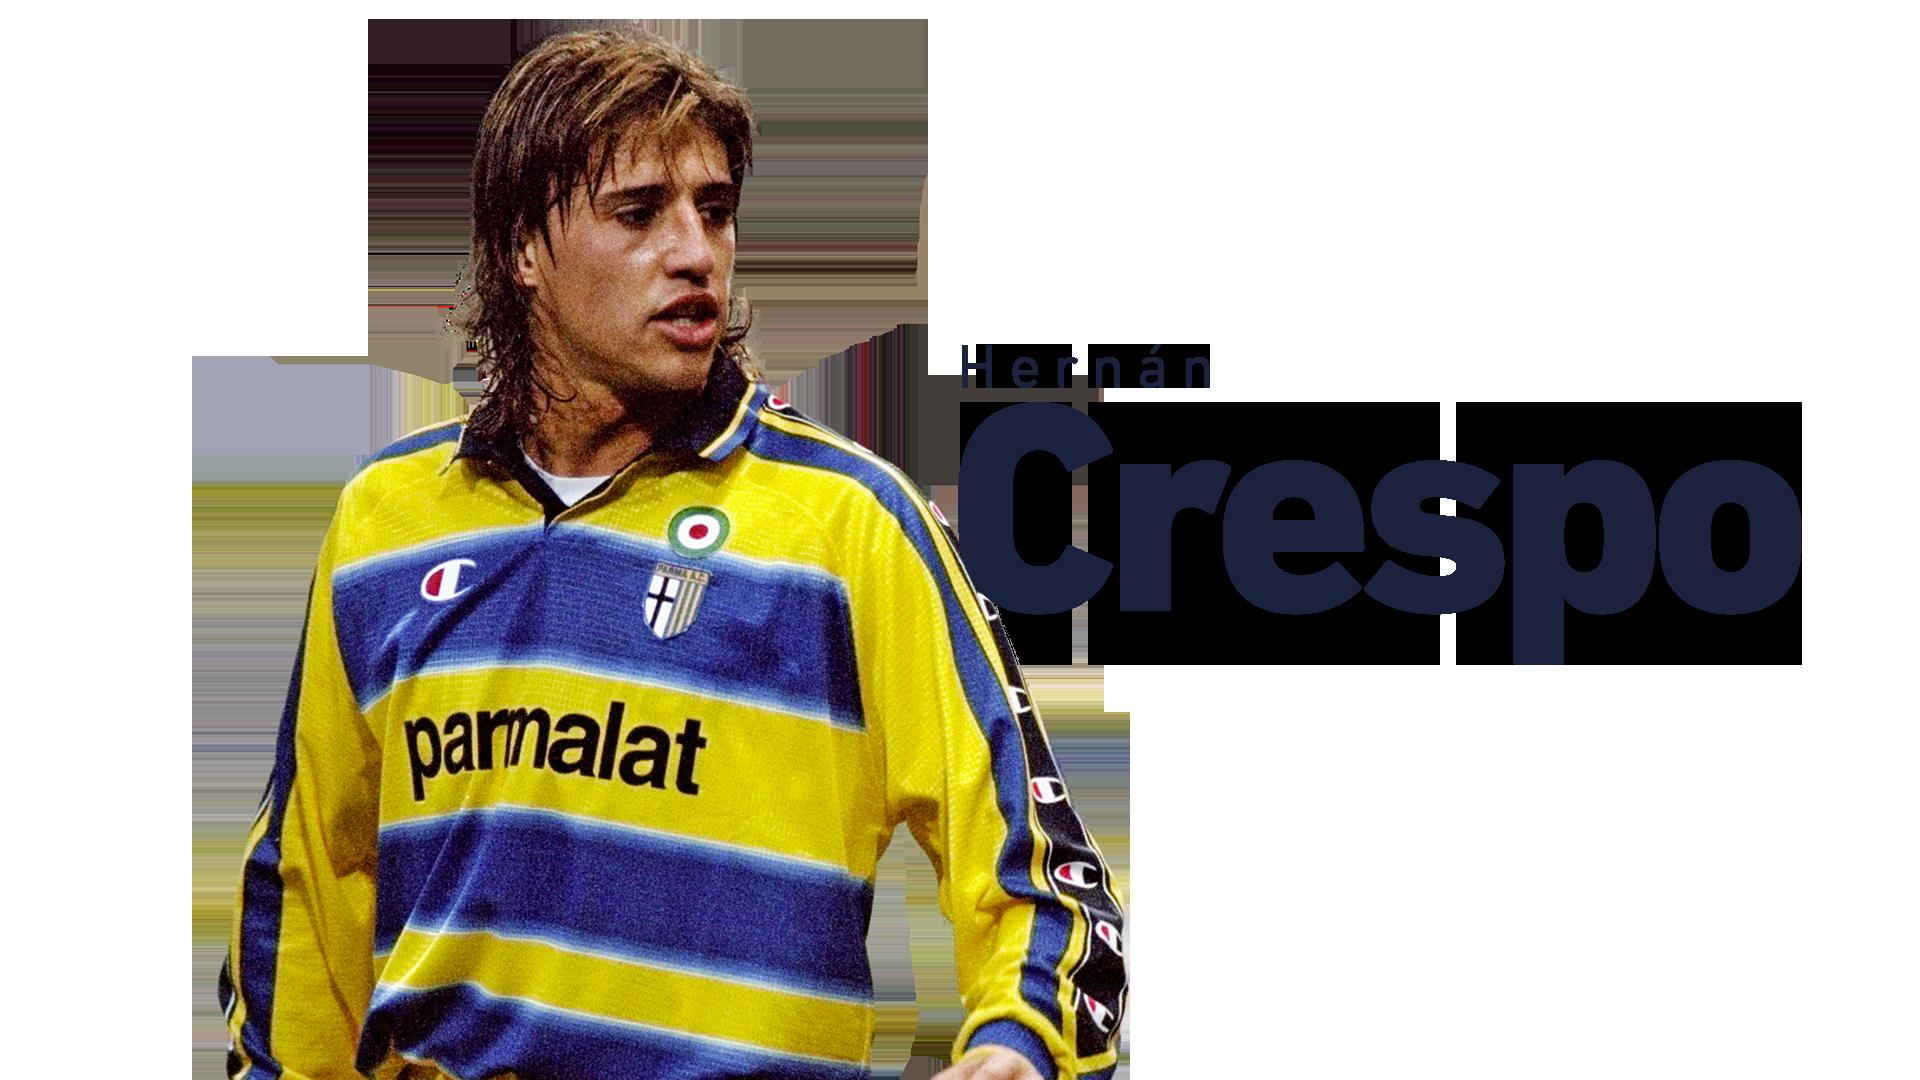 Crespo.png